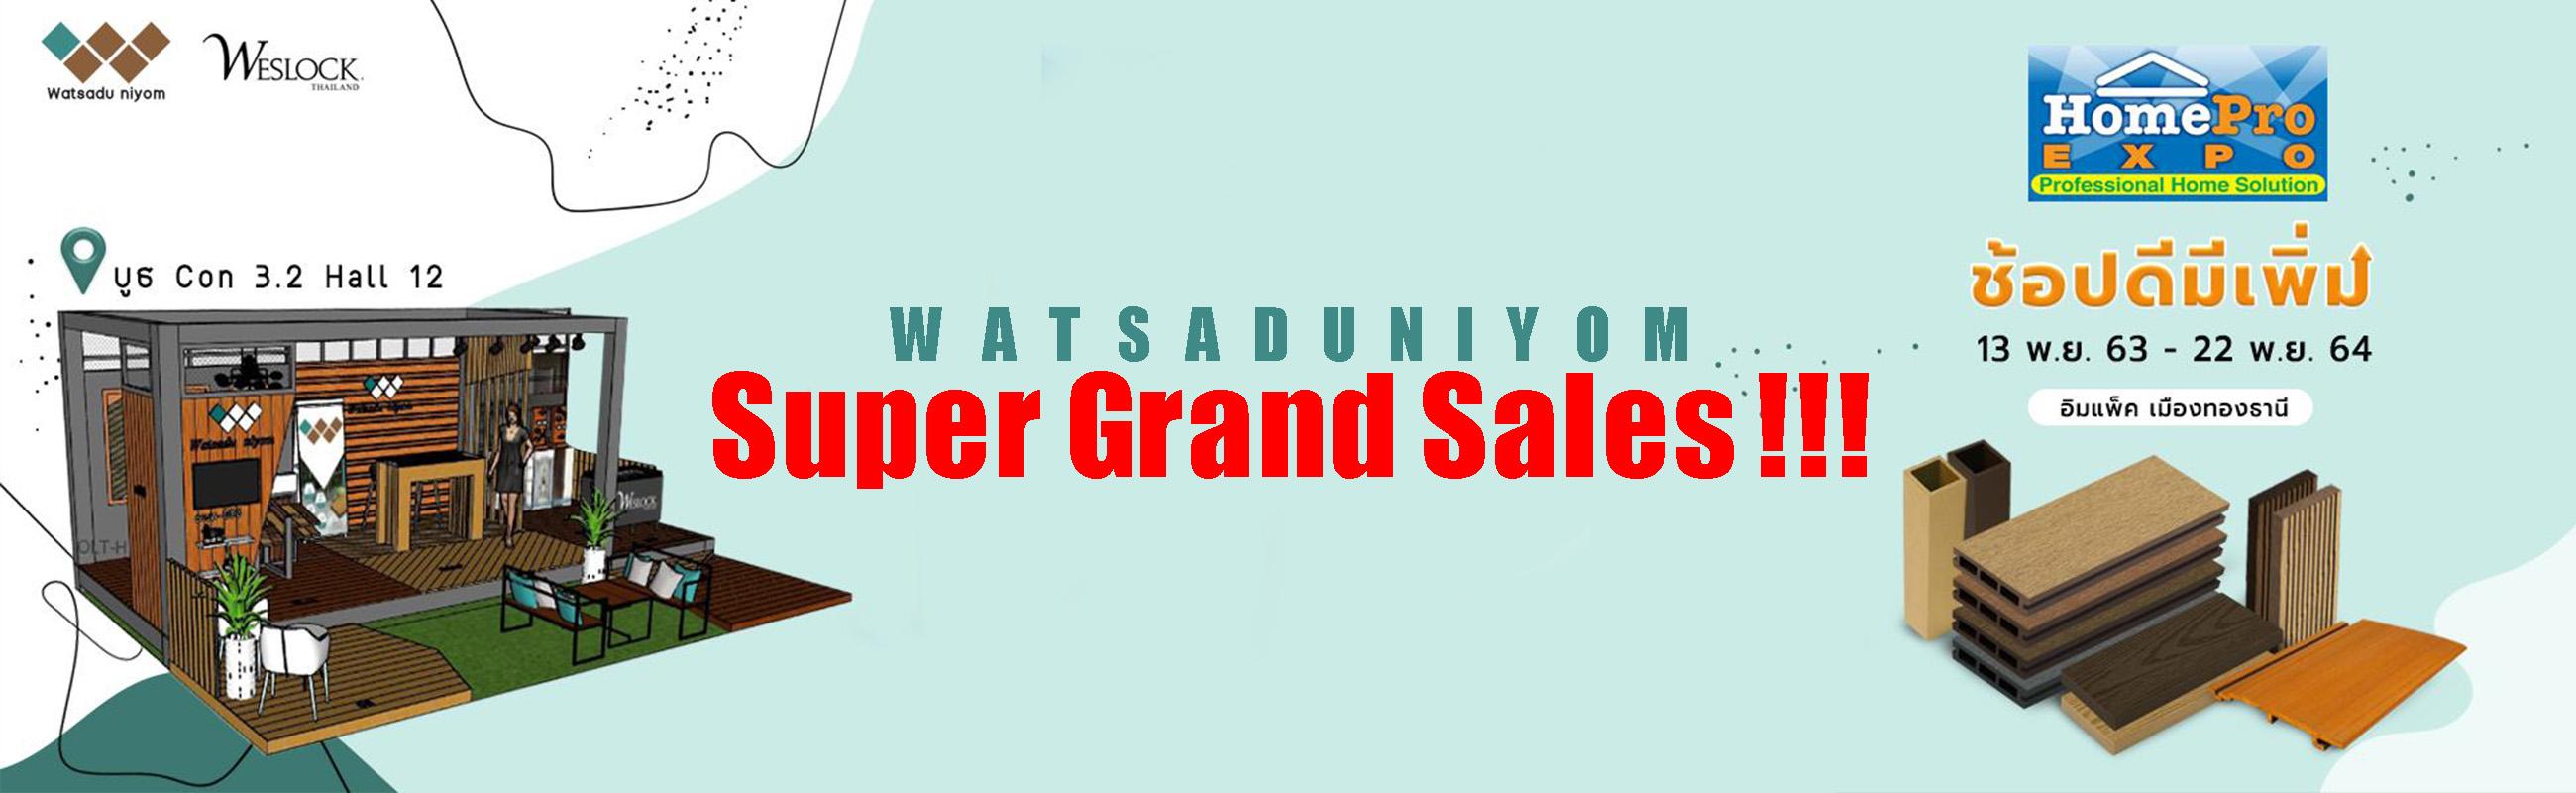 Watsaduniyom Super Grand Sales !!!